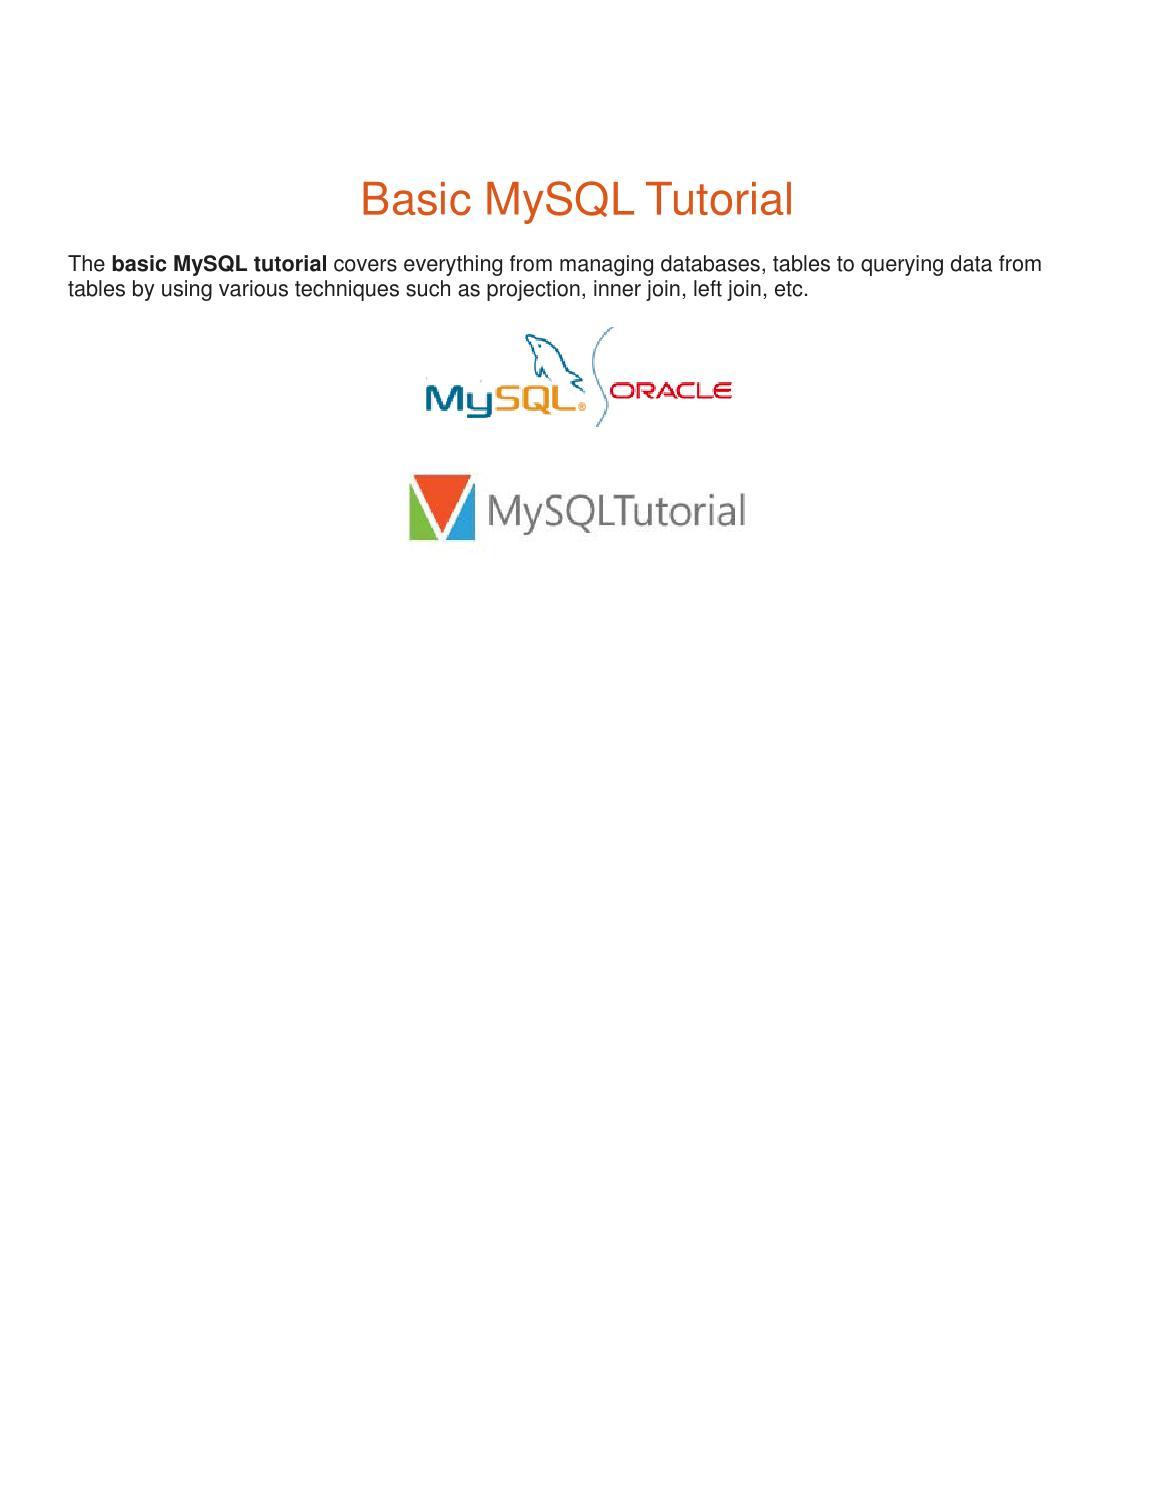 Mysql basic tutorial by thomasb issuu baditri Image collections